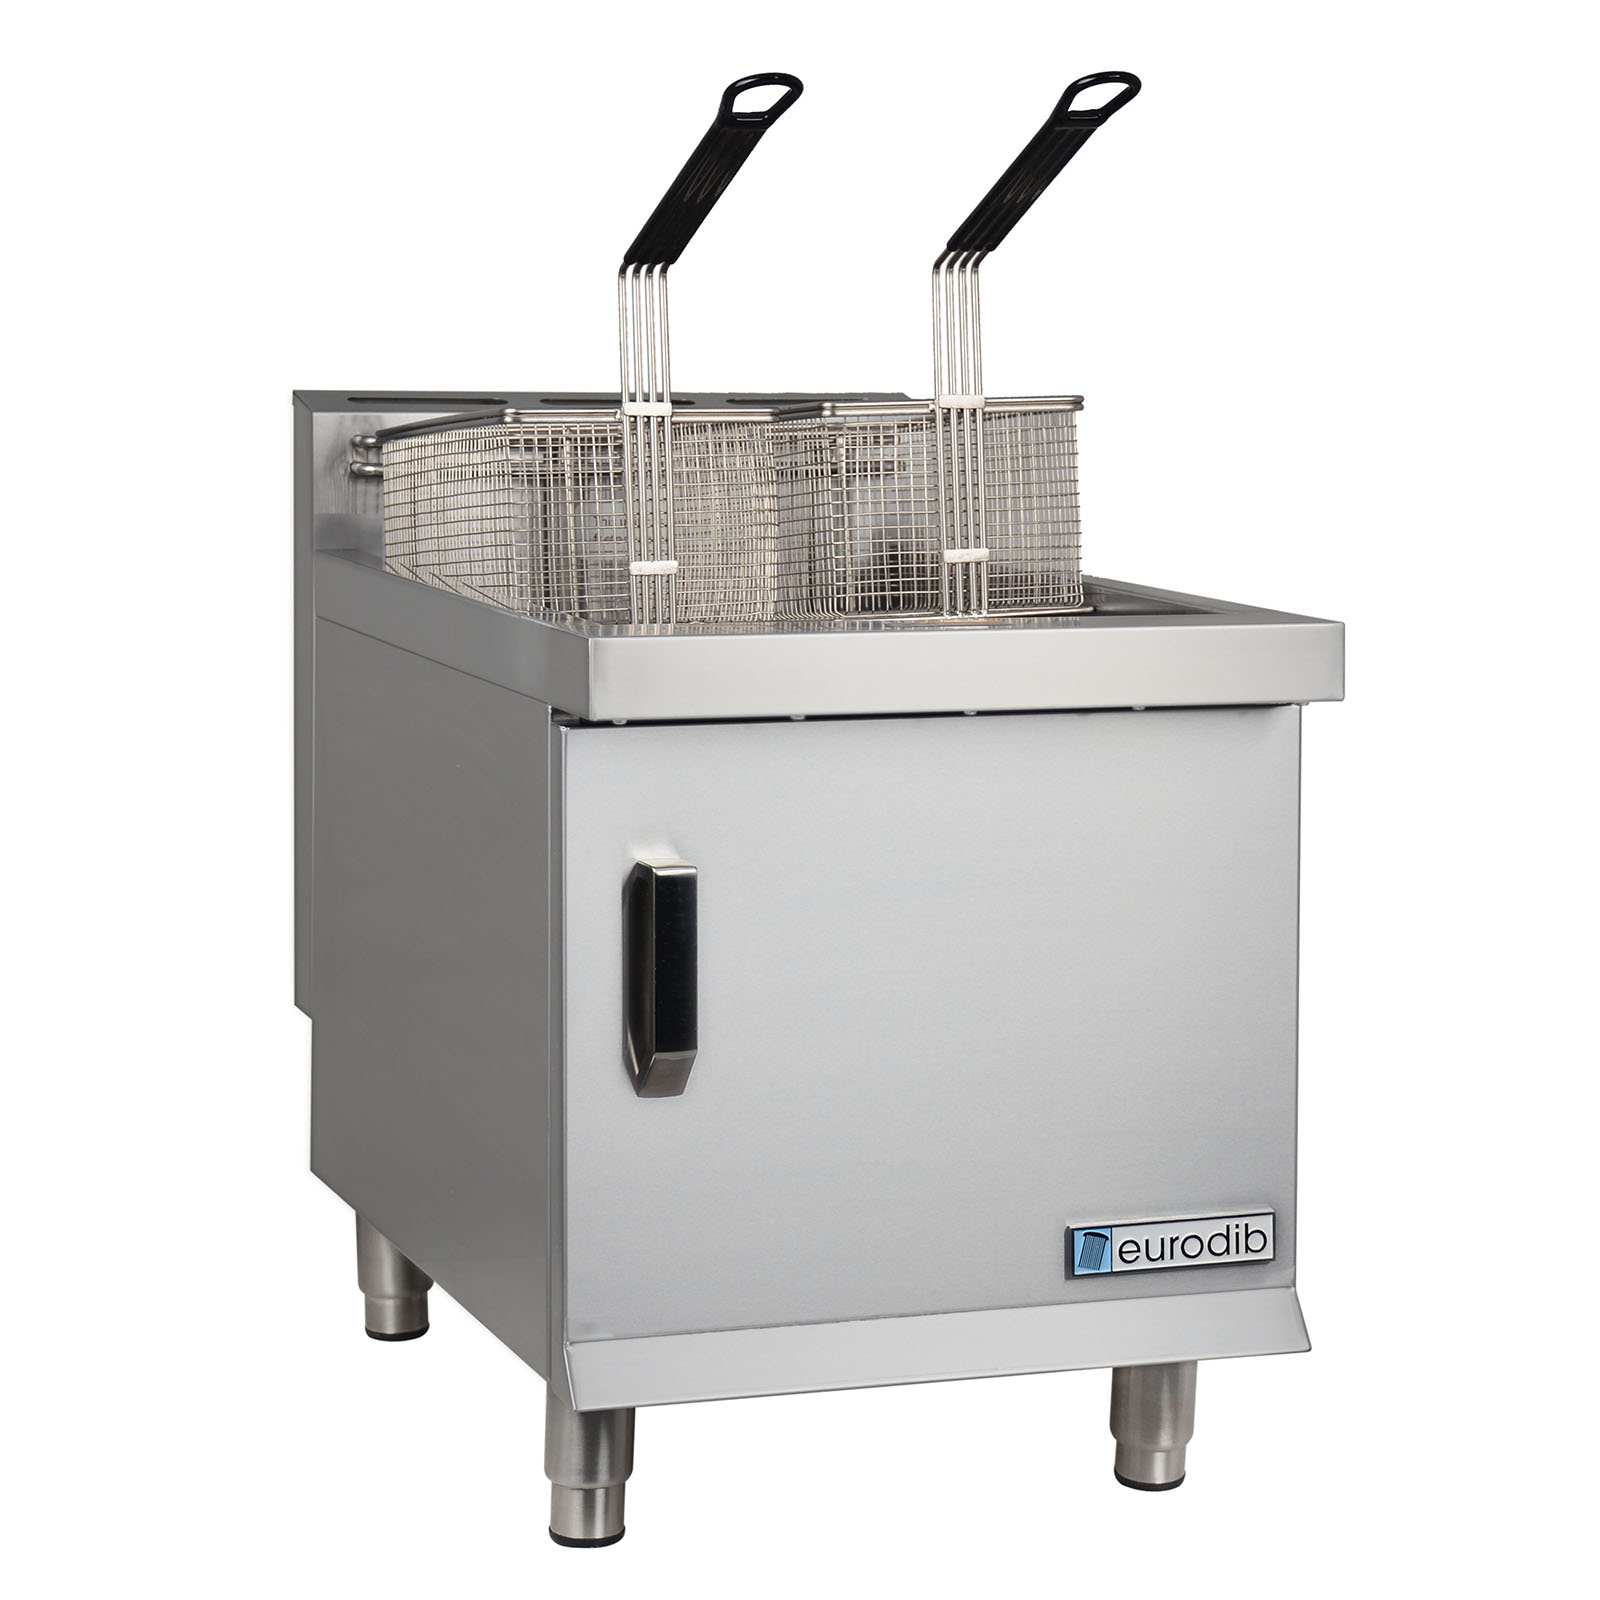 Eurodib USA T-CF30 fryer, gas, countertop, full pot